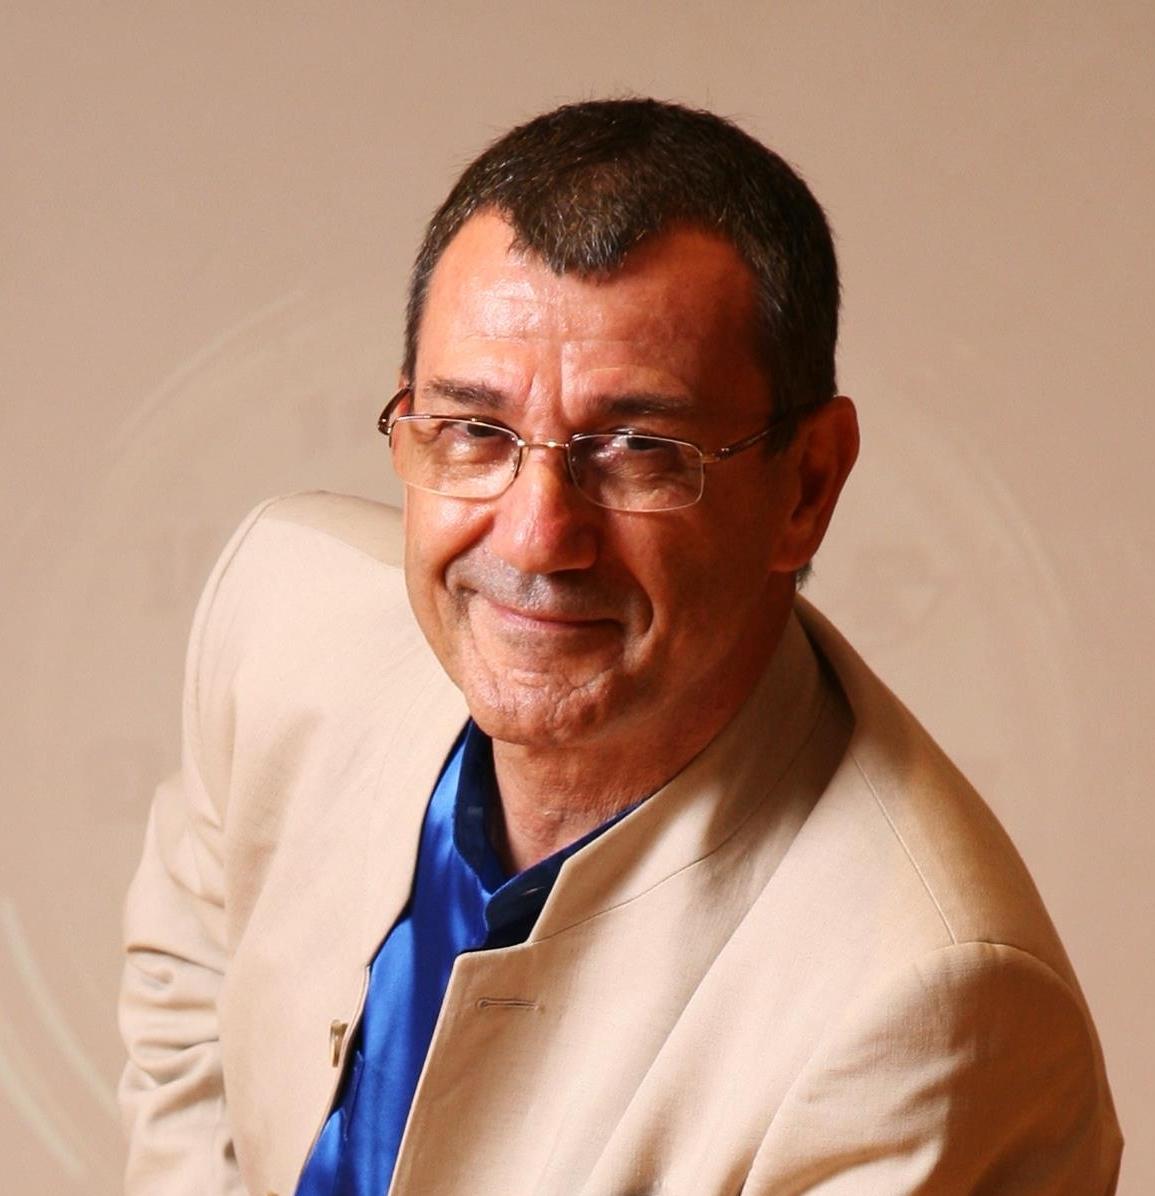 Vincent Calabrese (Watchmaker)